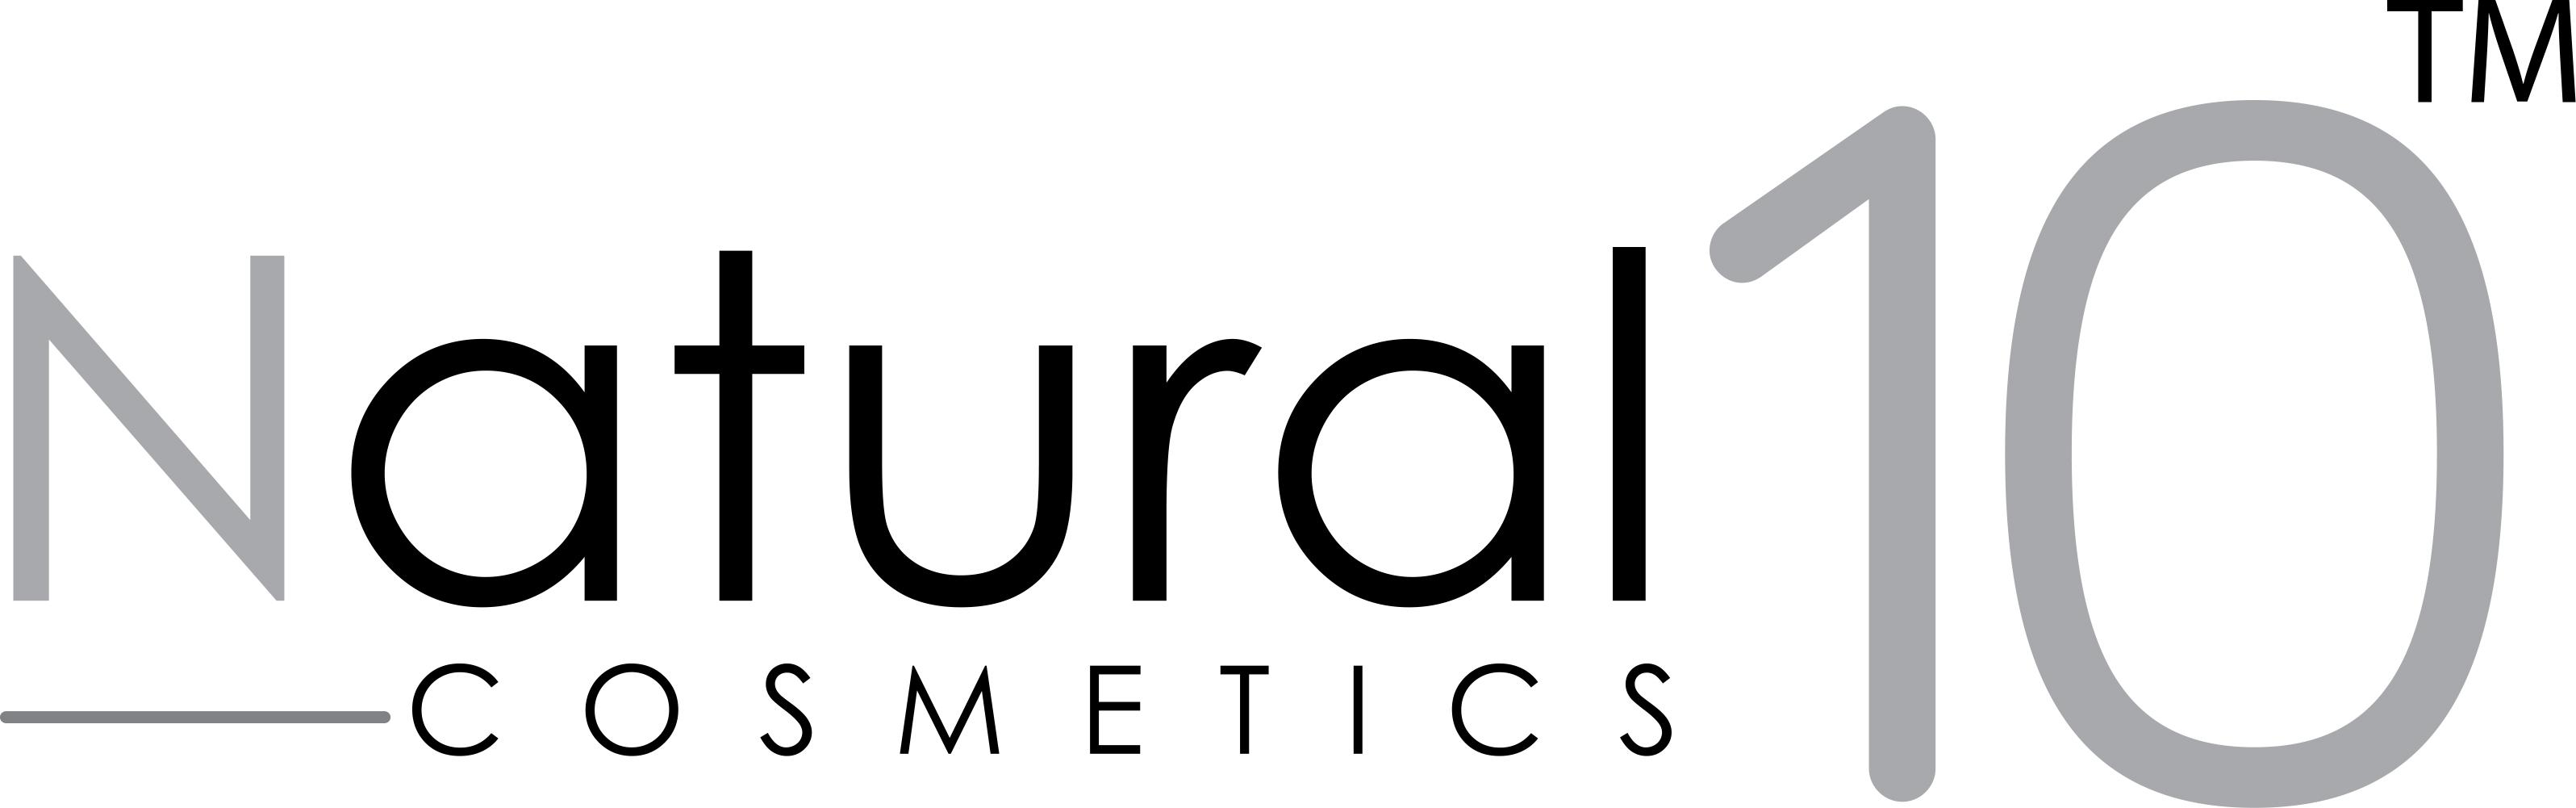 Natural10 Cosmetics™